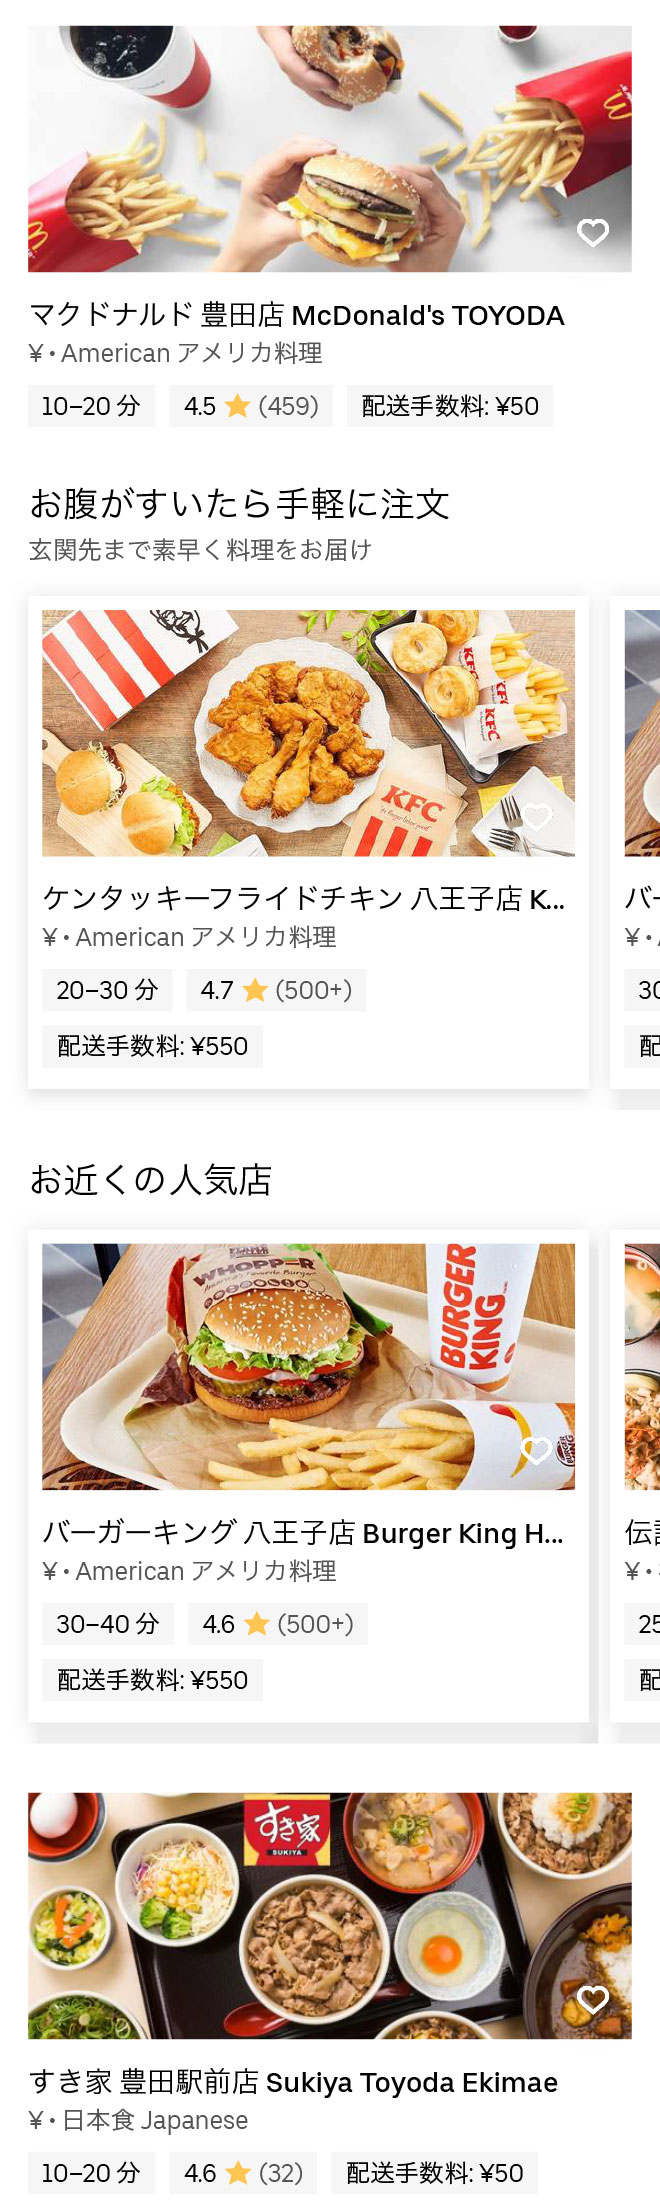 Tokyo toyoda menu 200401